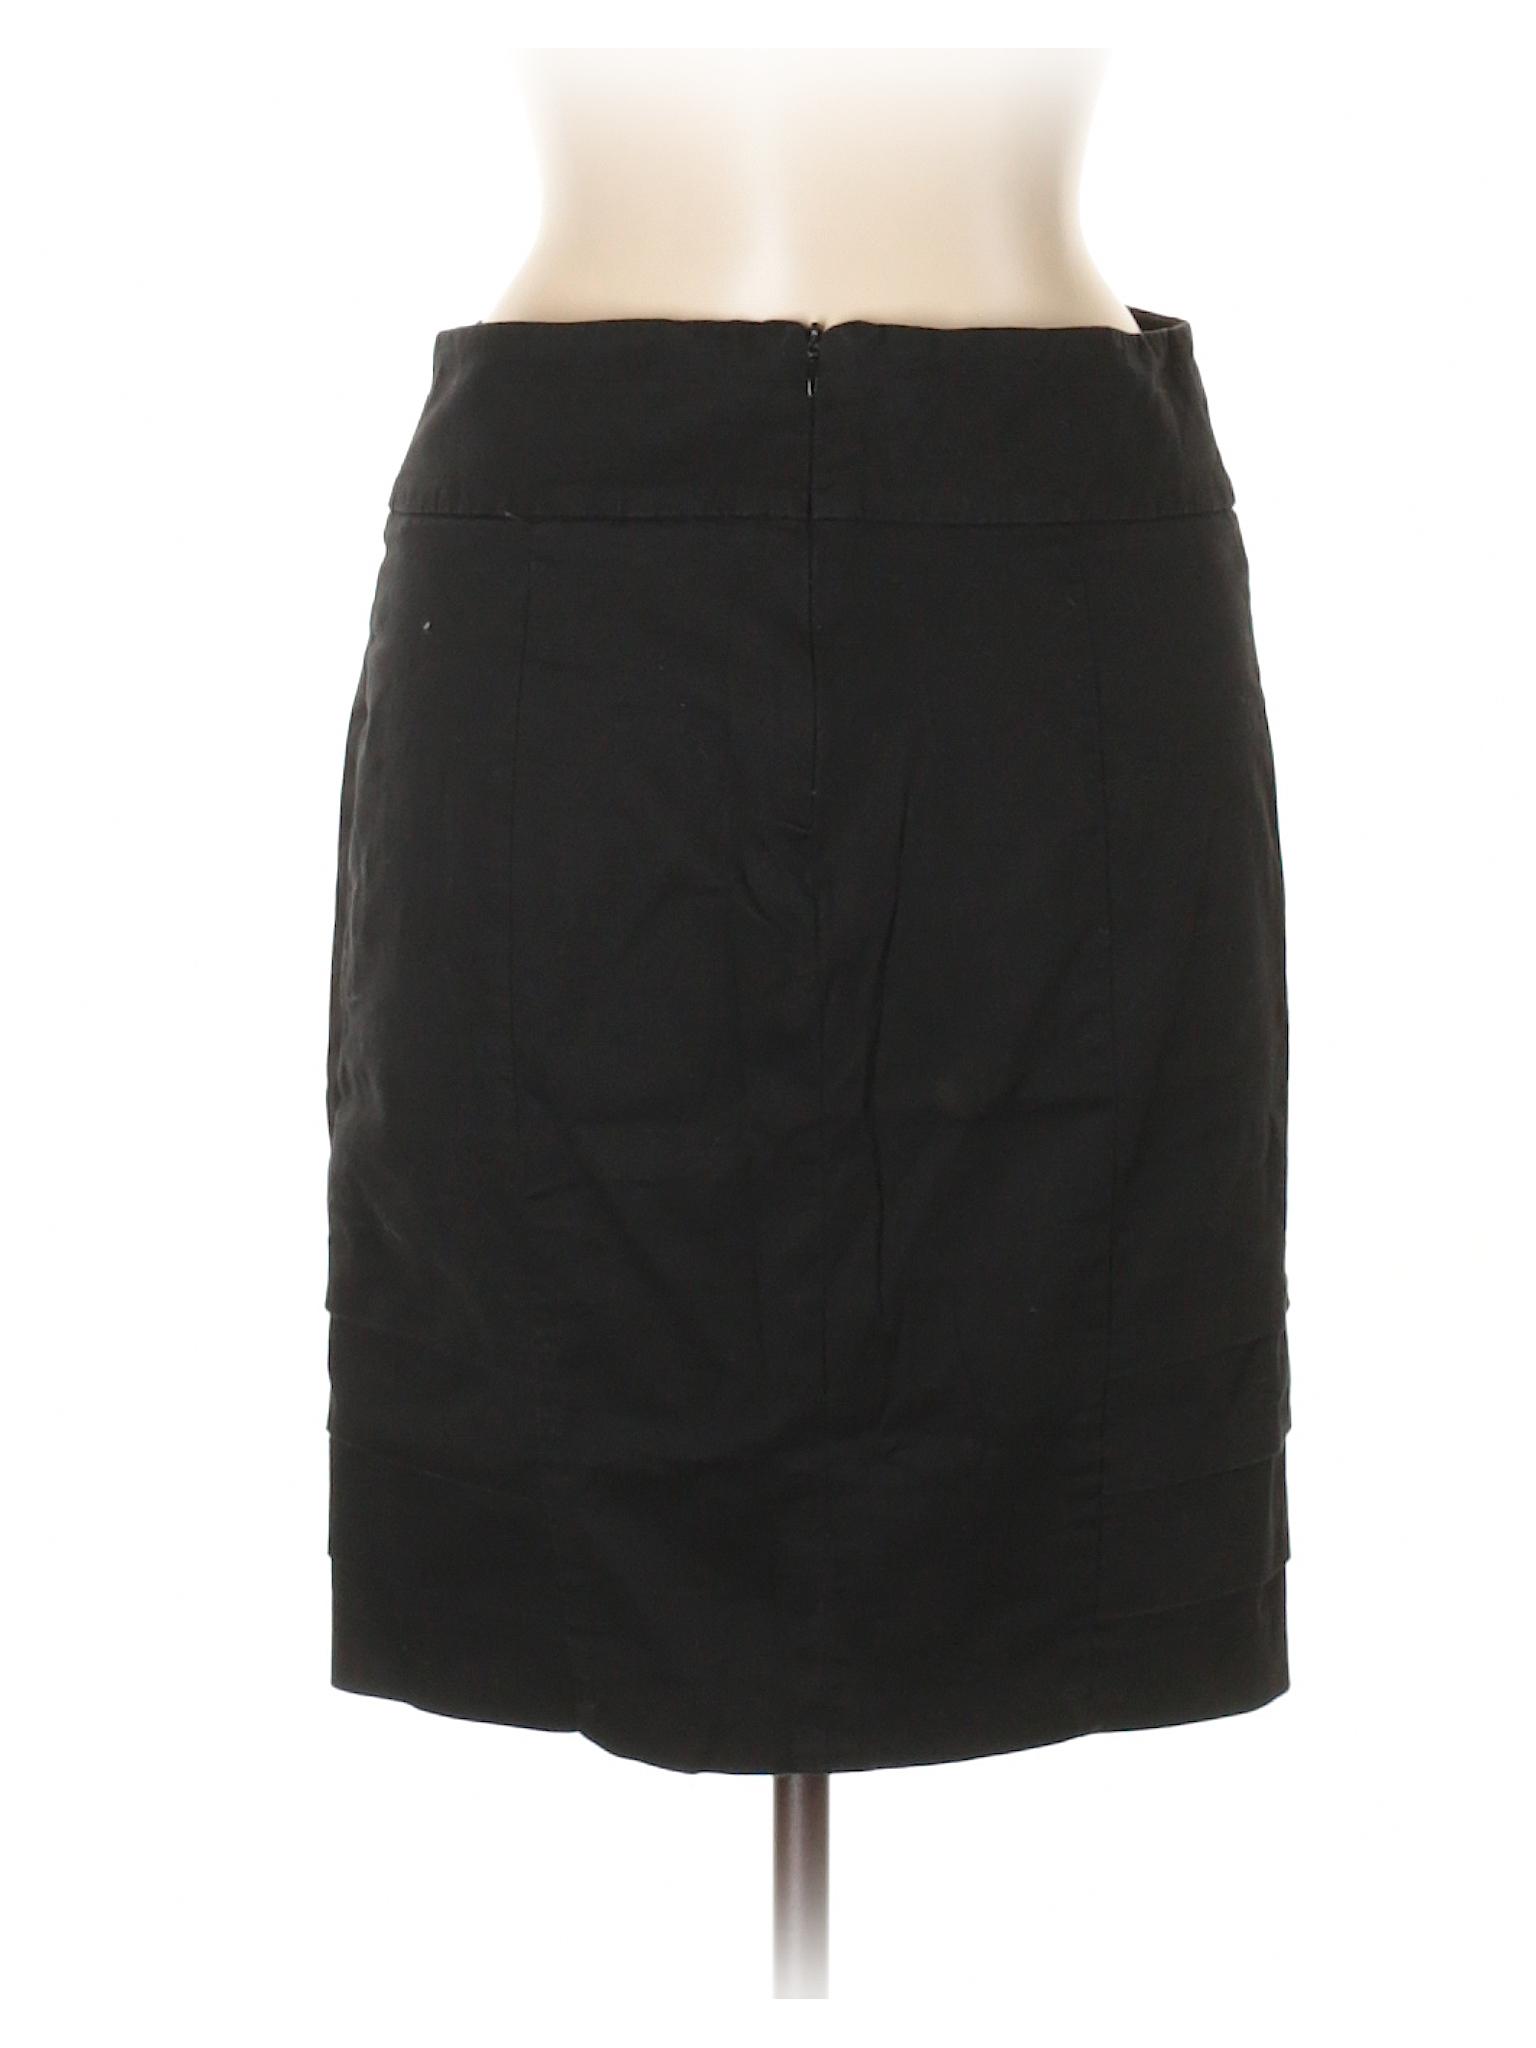 Skirt Casual Boutique Boutique Skirt Boutique Skirt Casual Boutique Casual xBqdwIIE